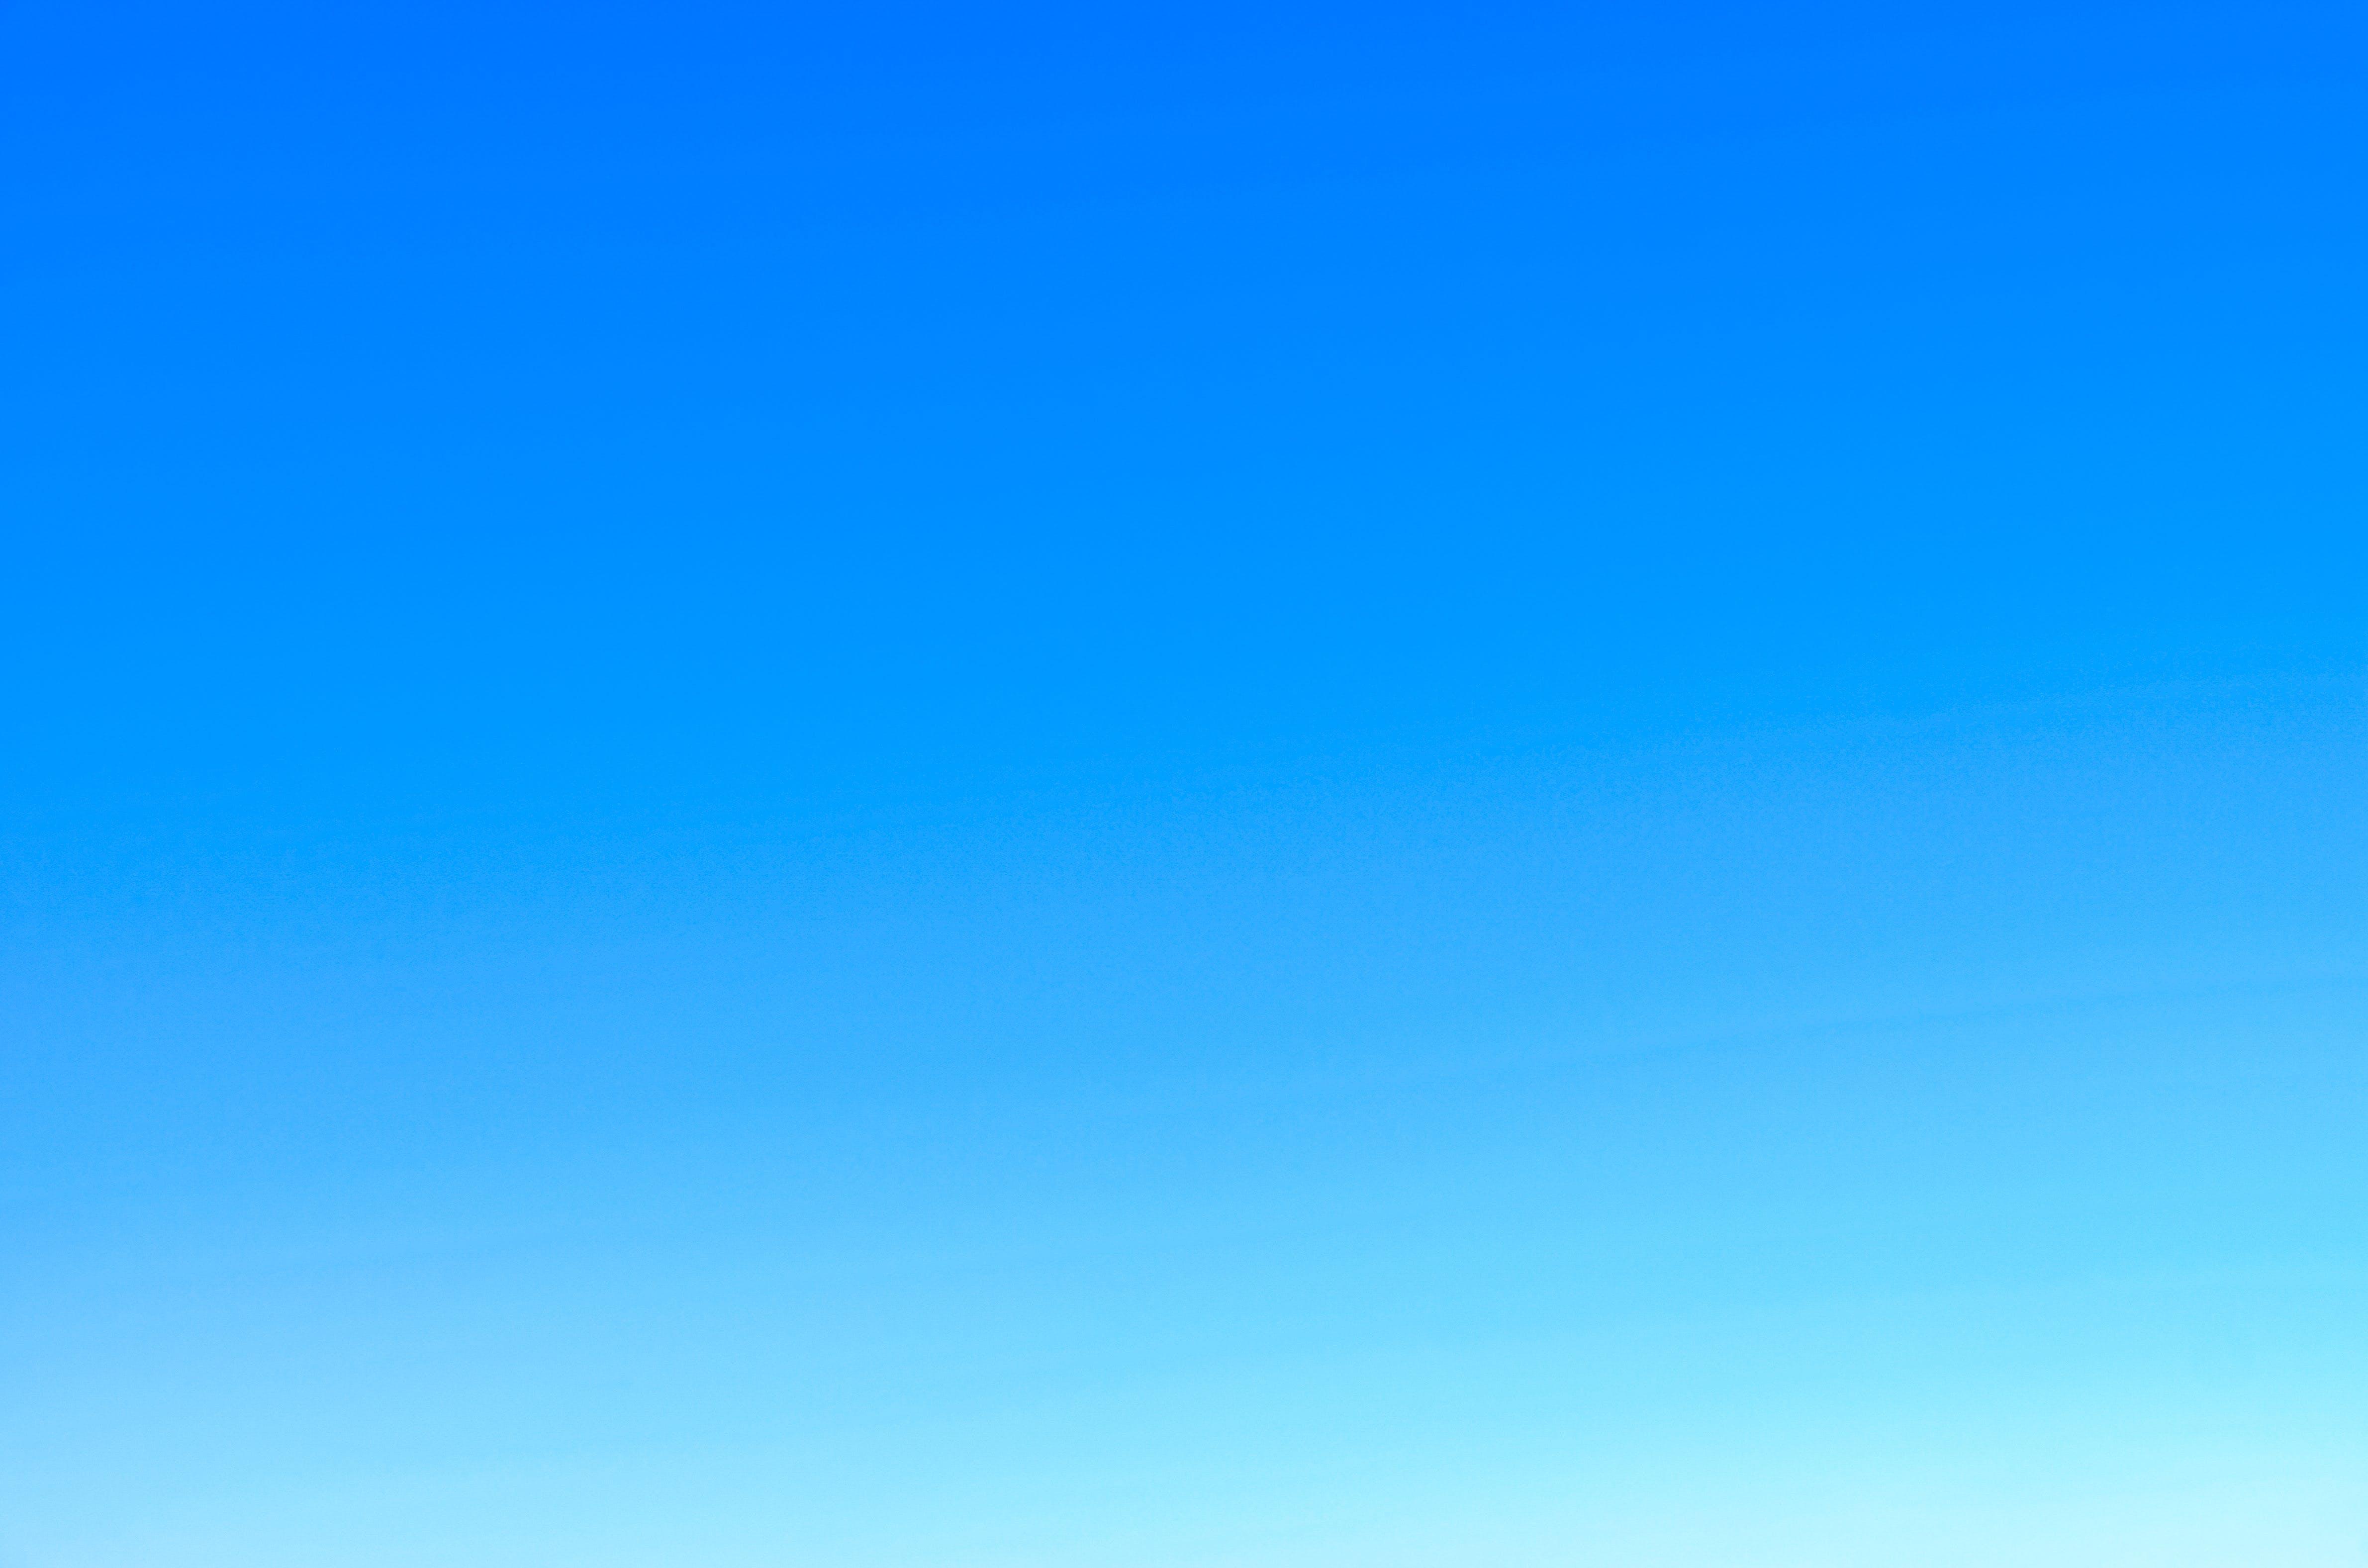 Foto stok gratis berbayang, gambar langit, gradasi, langit